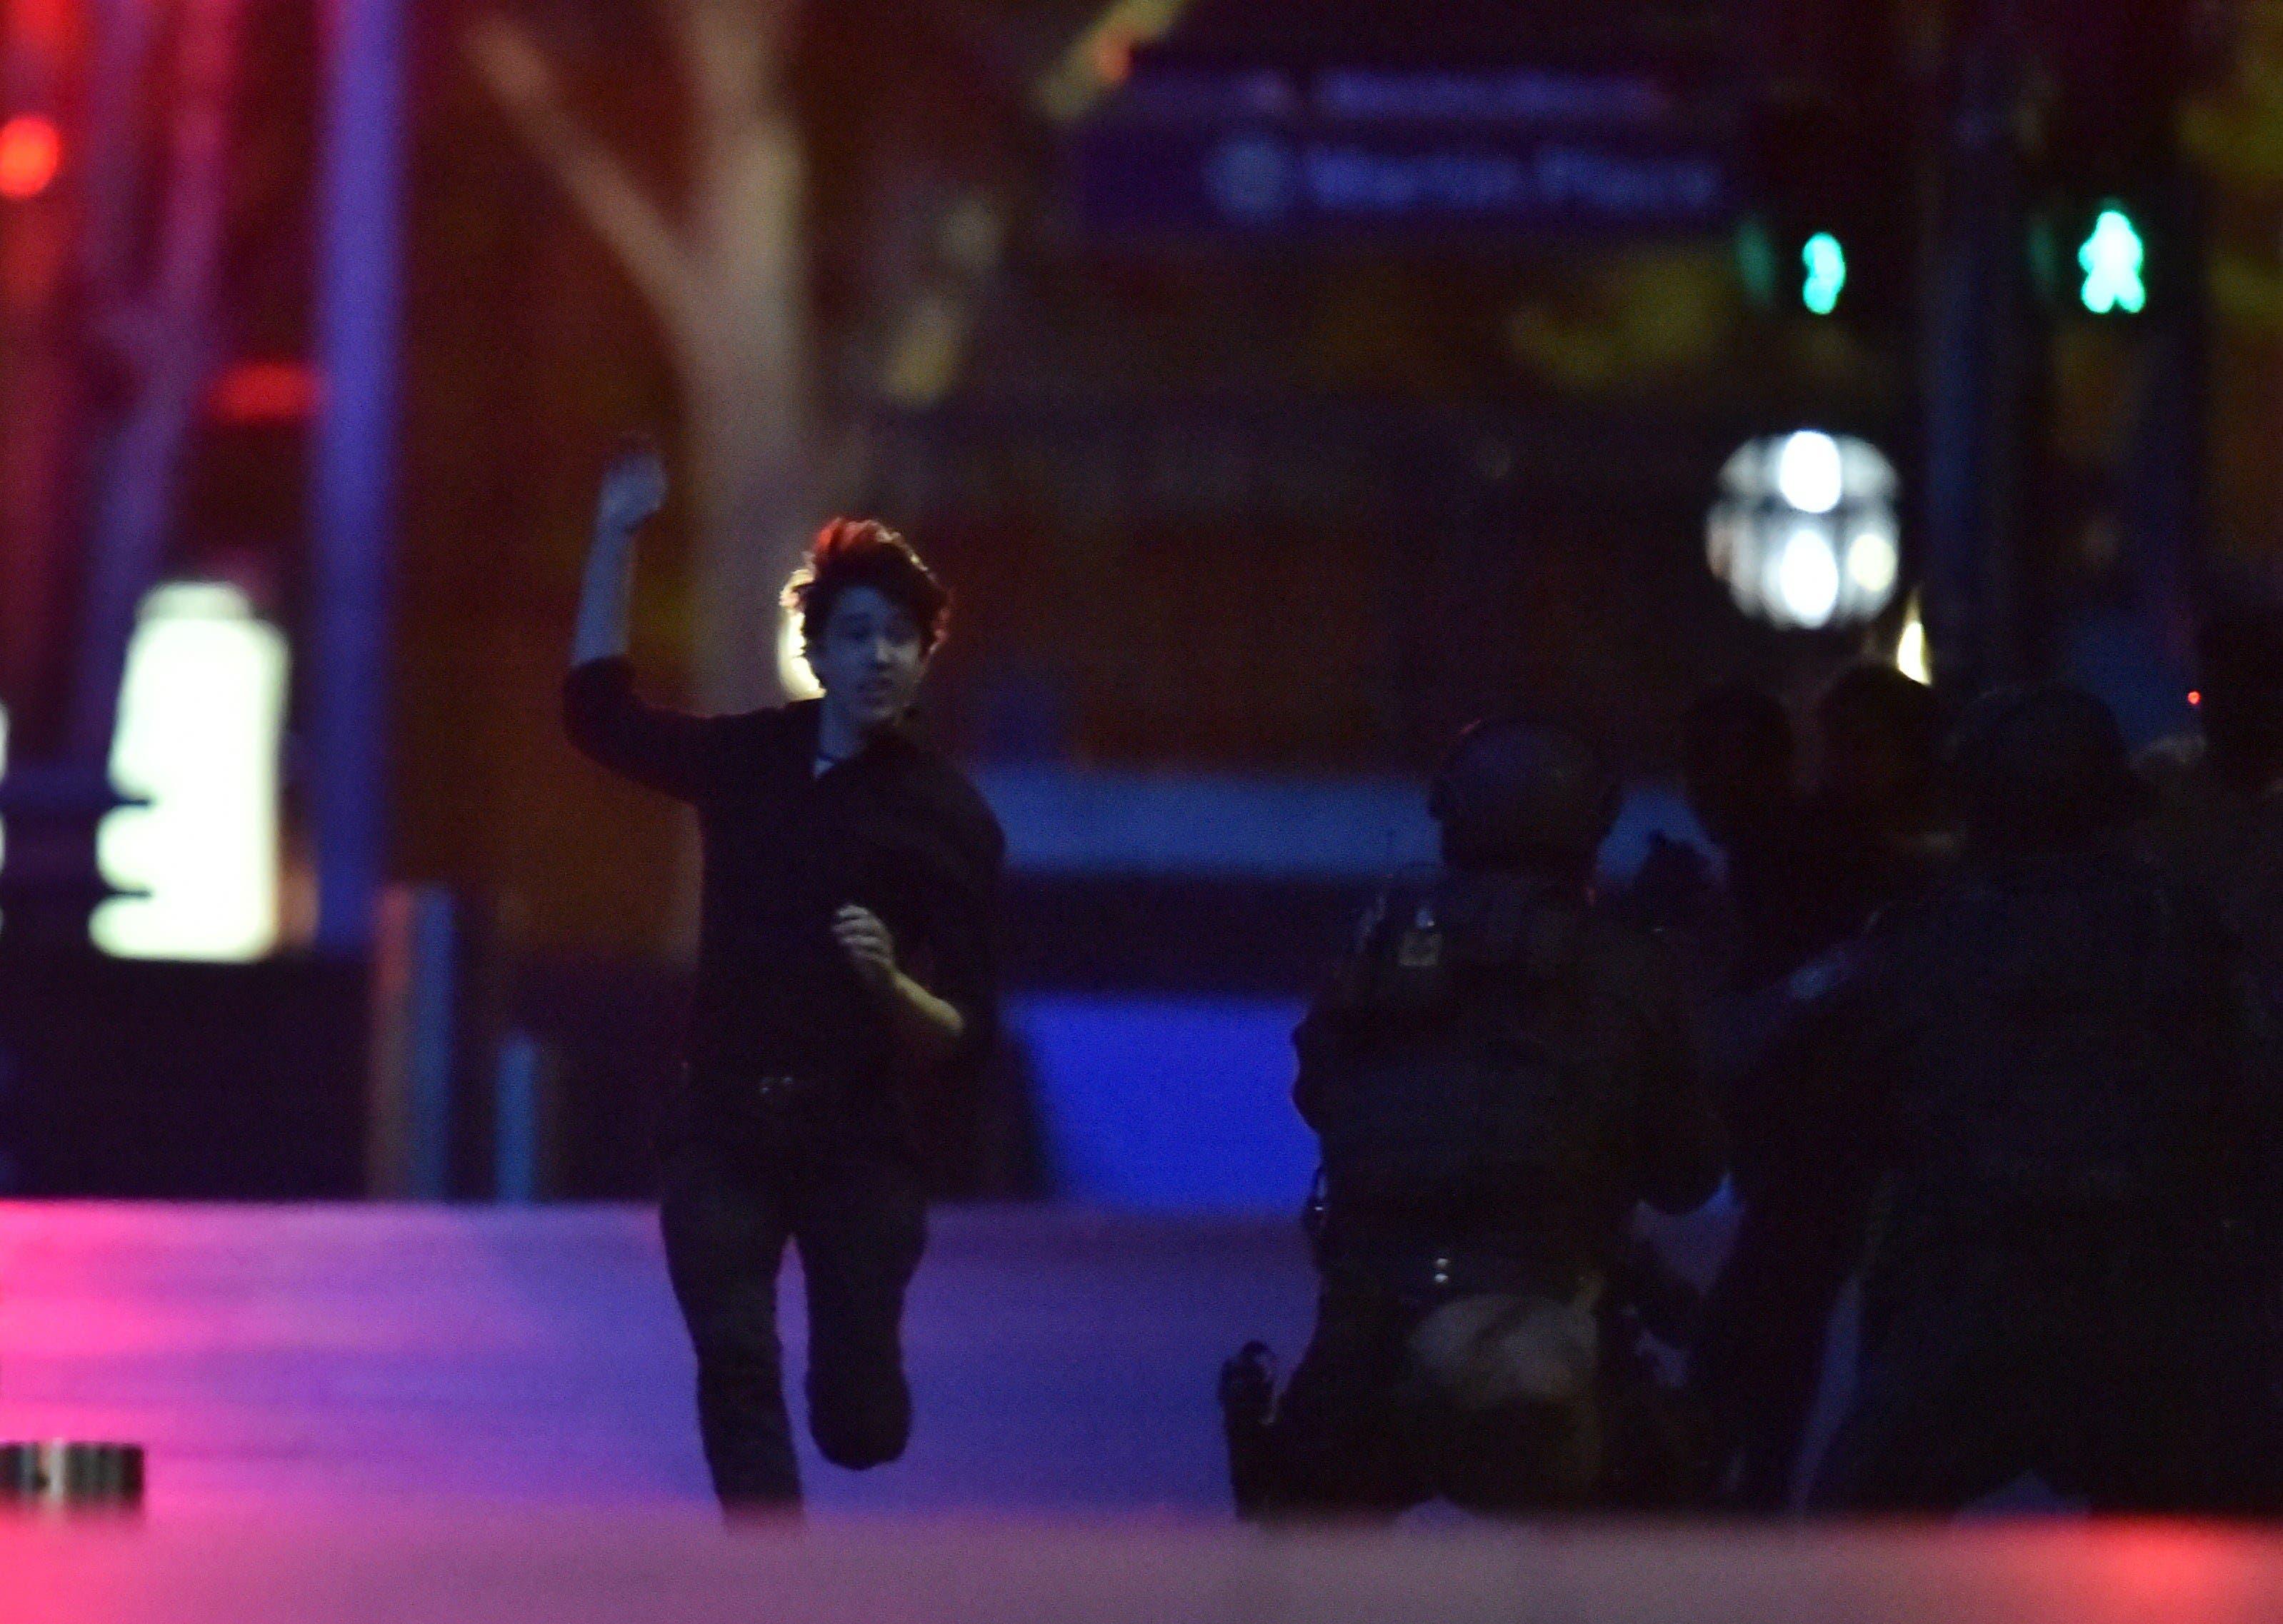 Police end Sydney siege